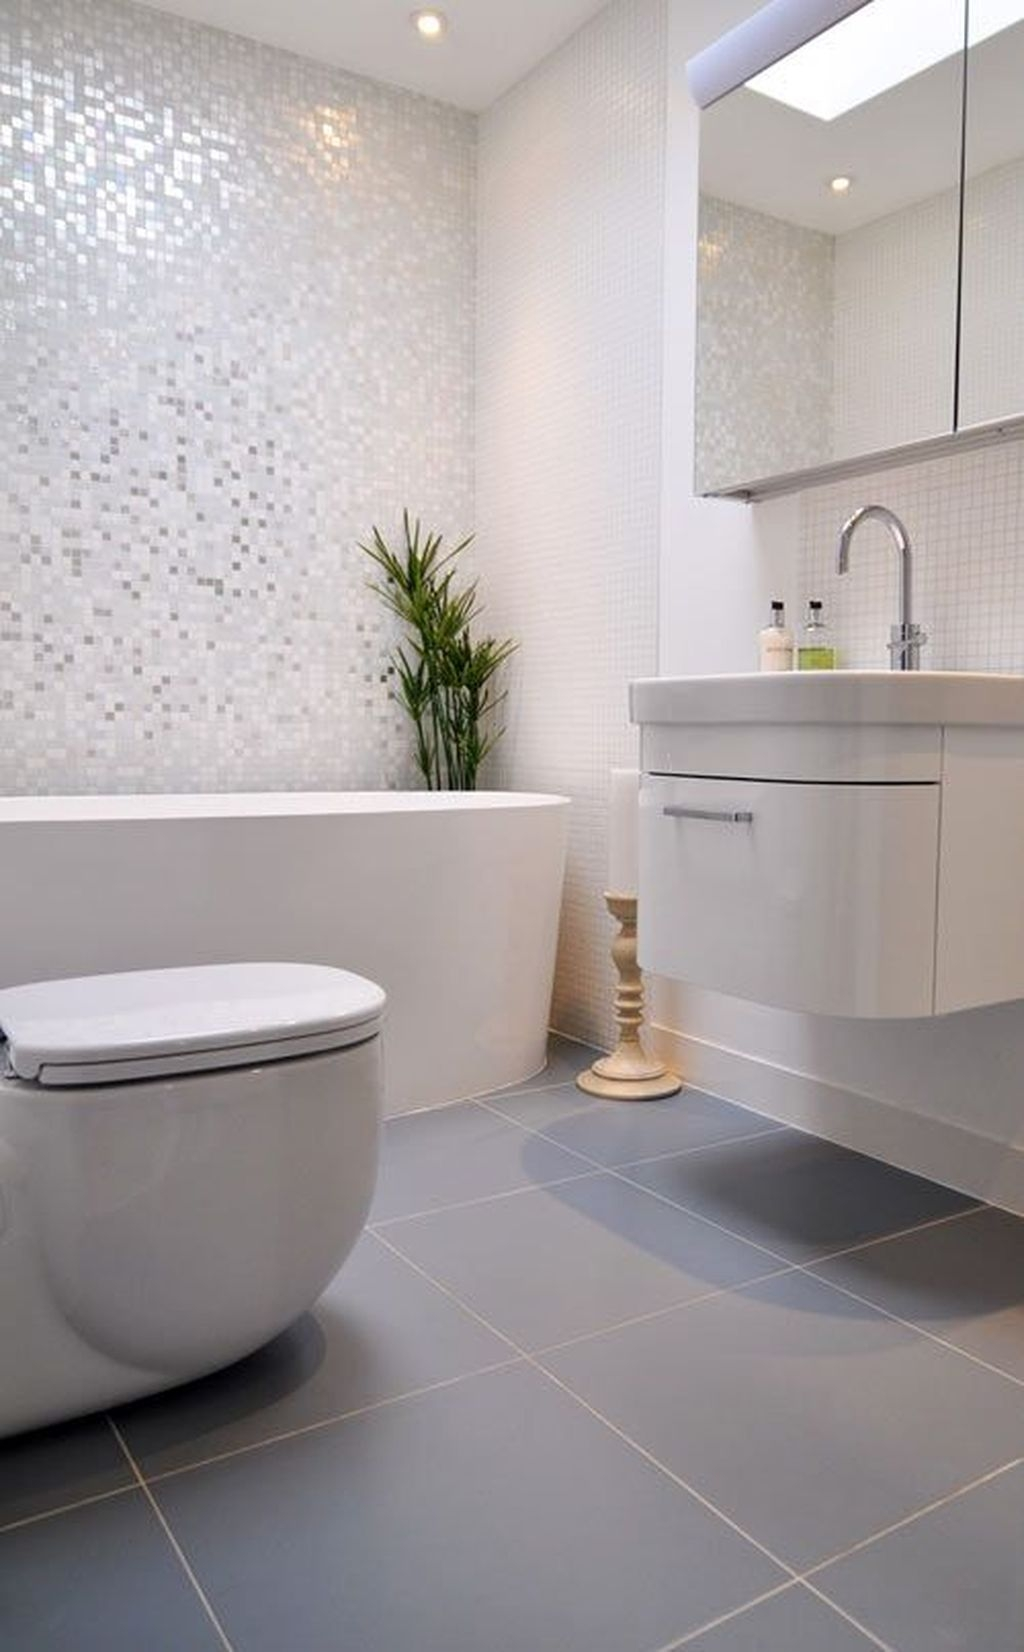 39 Cool And Stylish Small Bathroom Design Ideas30